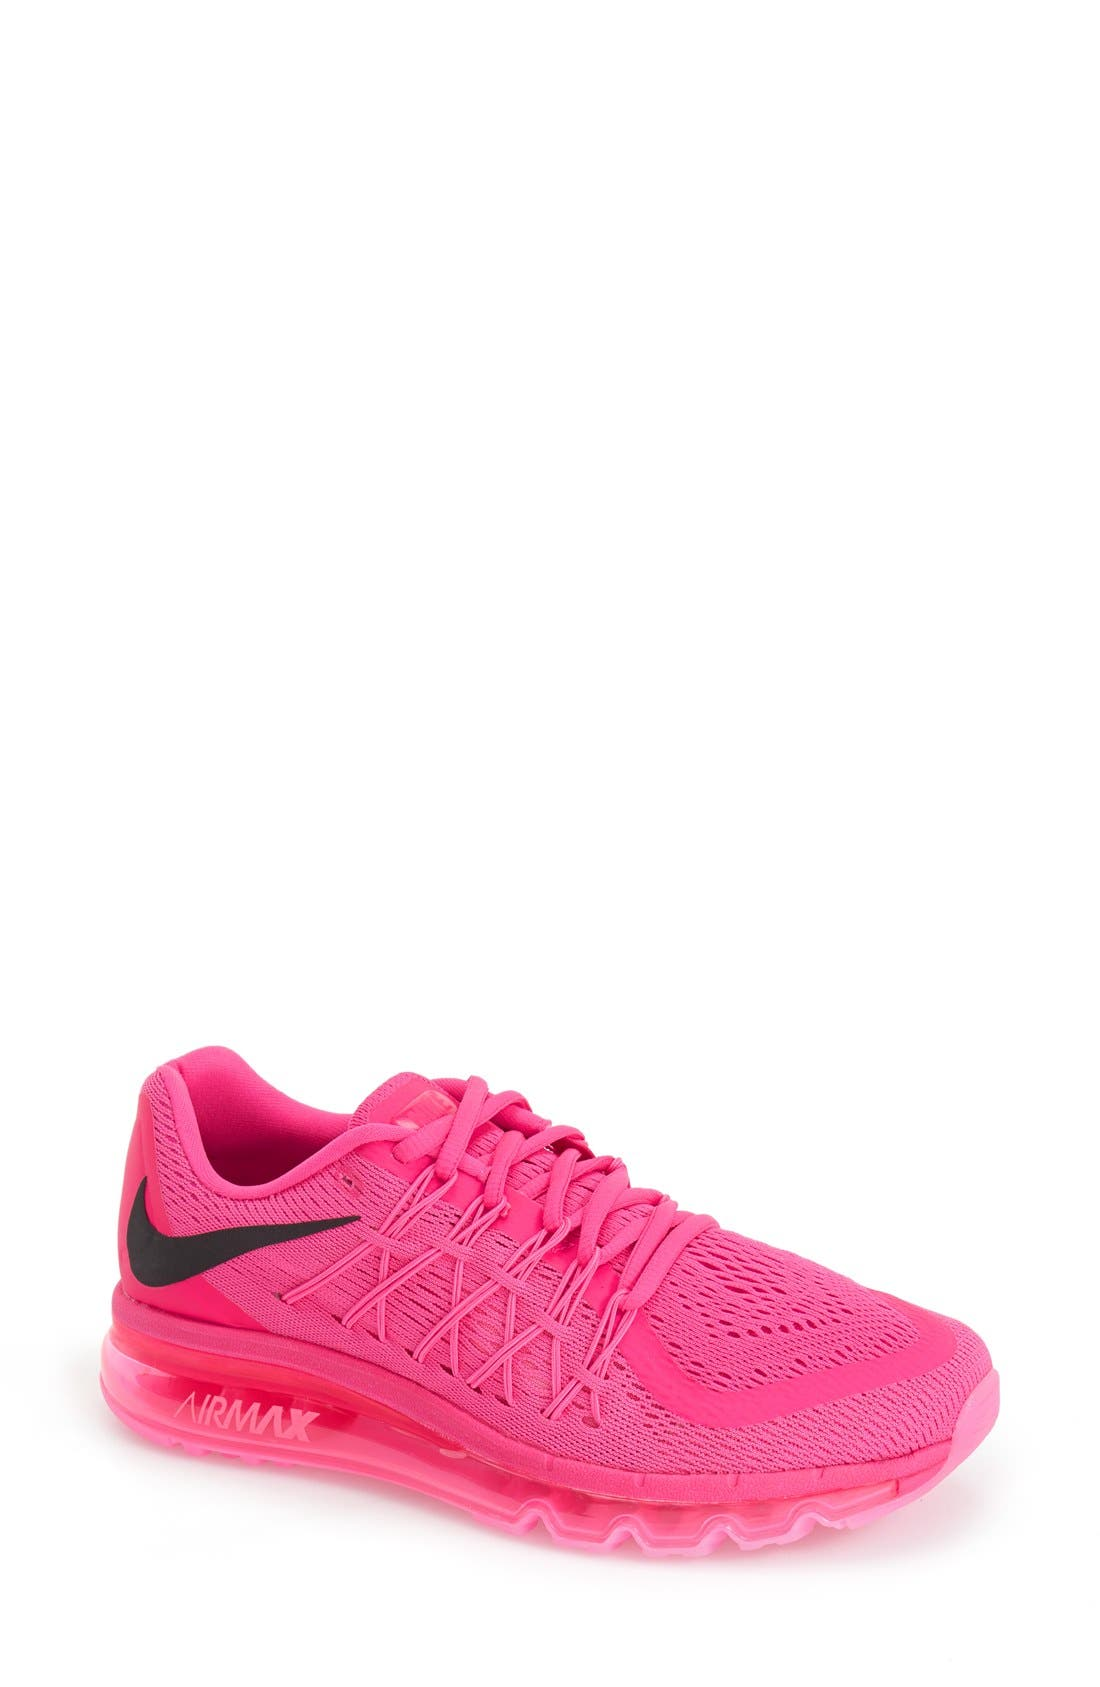 Main Image - Nike 'Air Max 15' Running Shoe (Women)